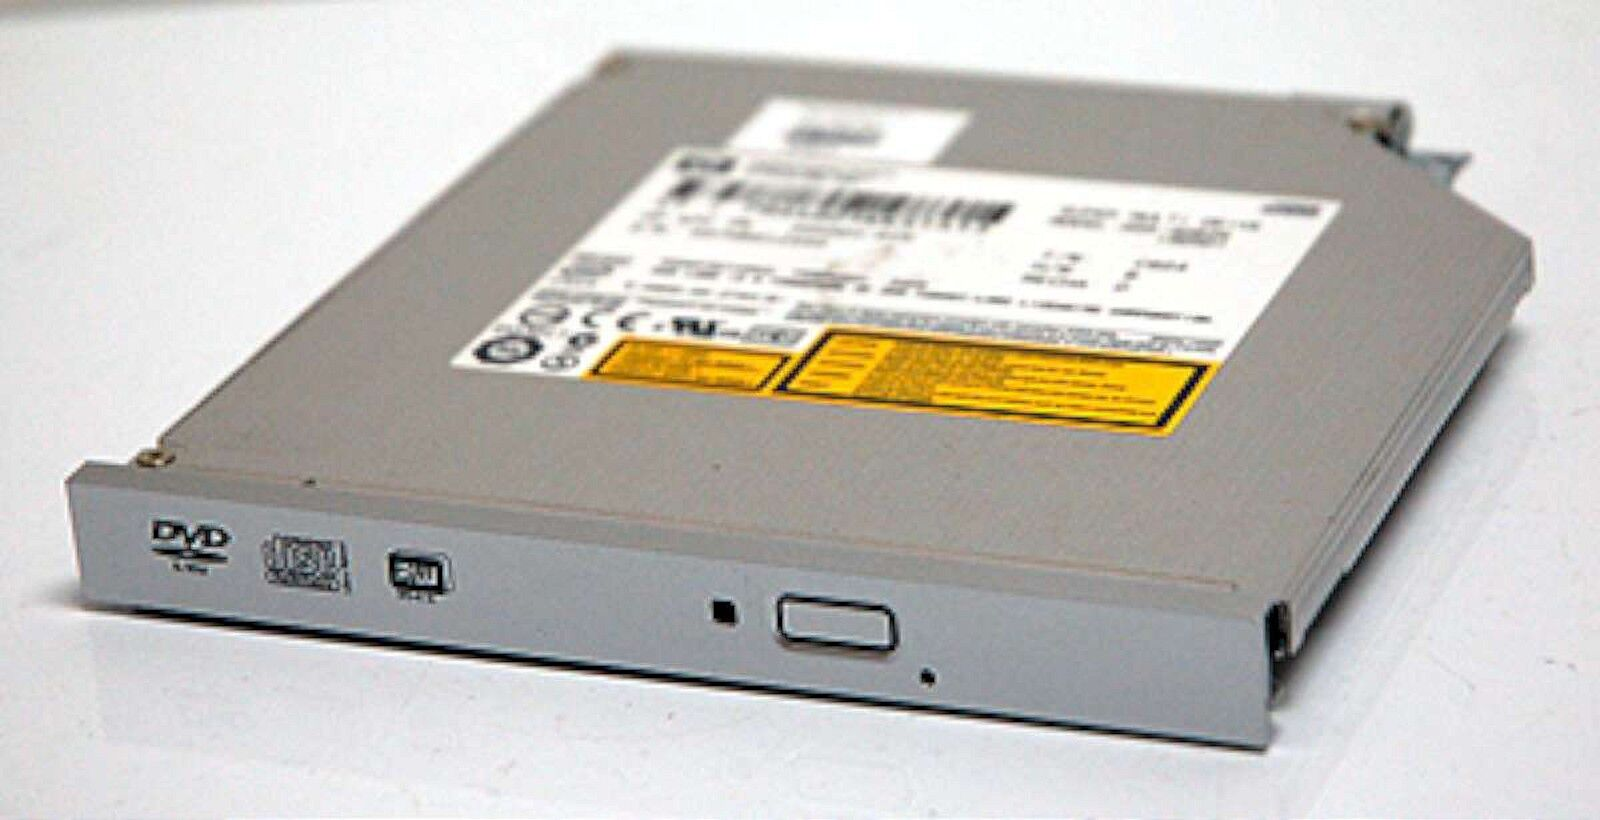 COMPAQ PRESARIO V4000 CDDVD DRIVERS WINDOWS XP